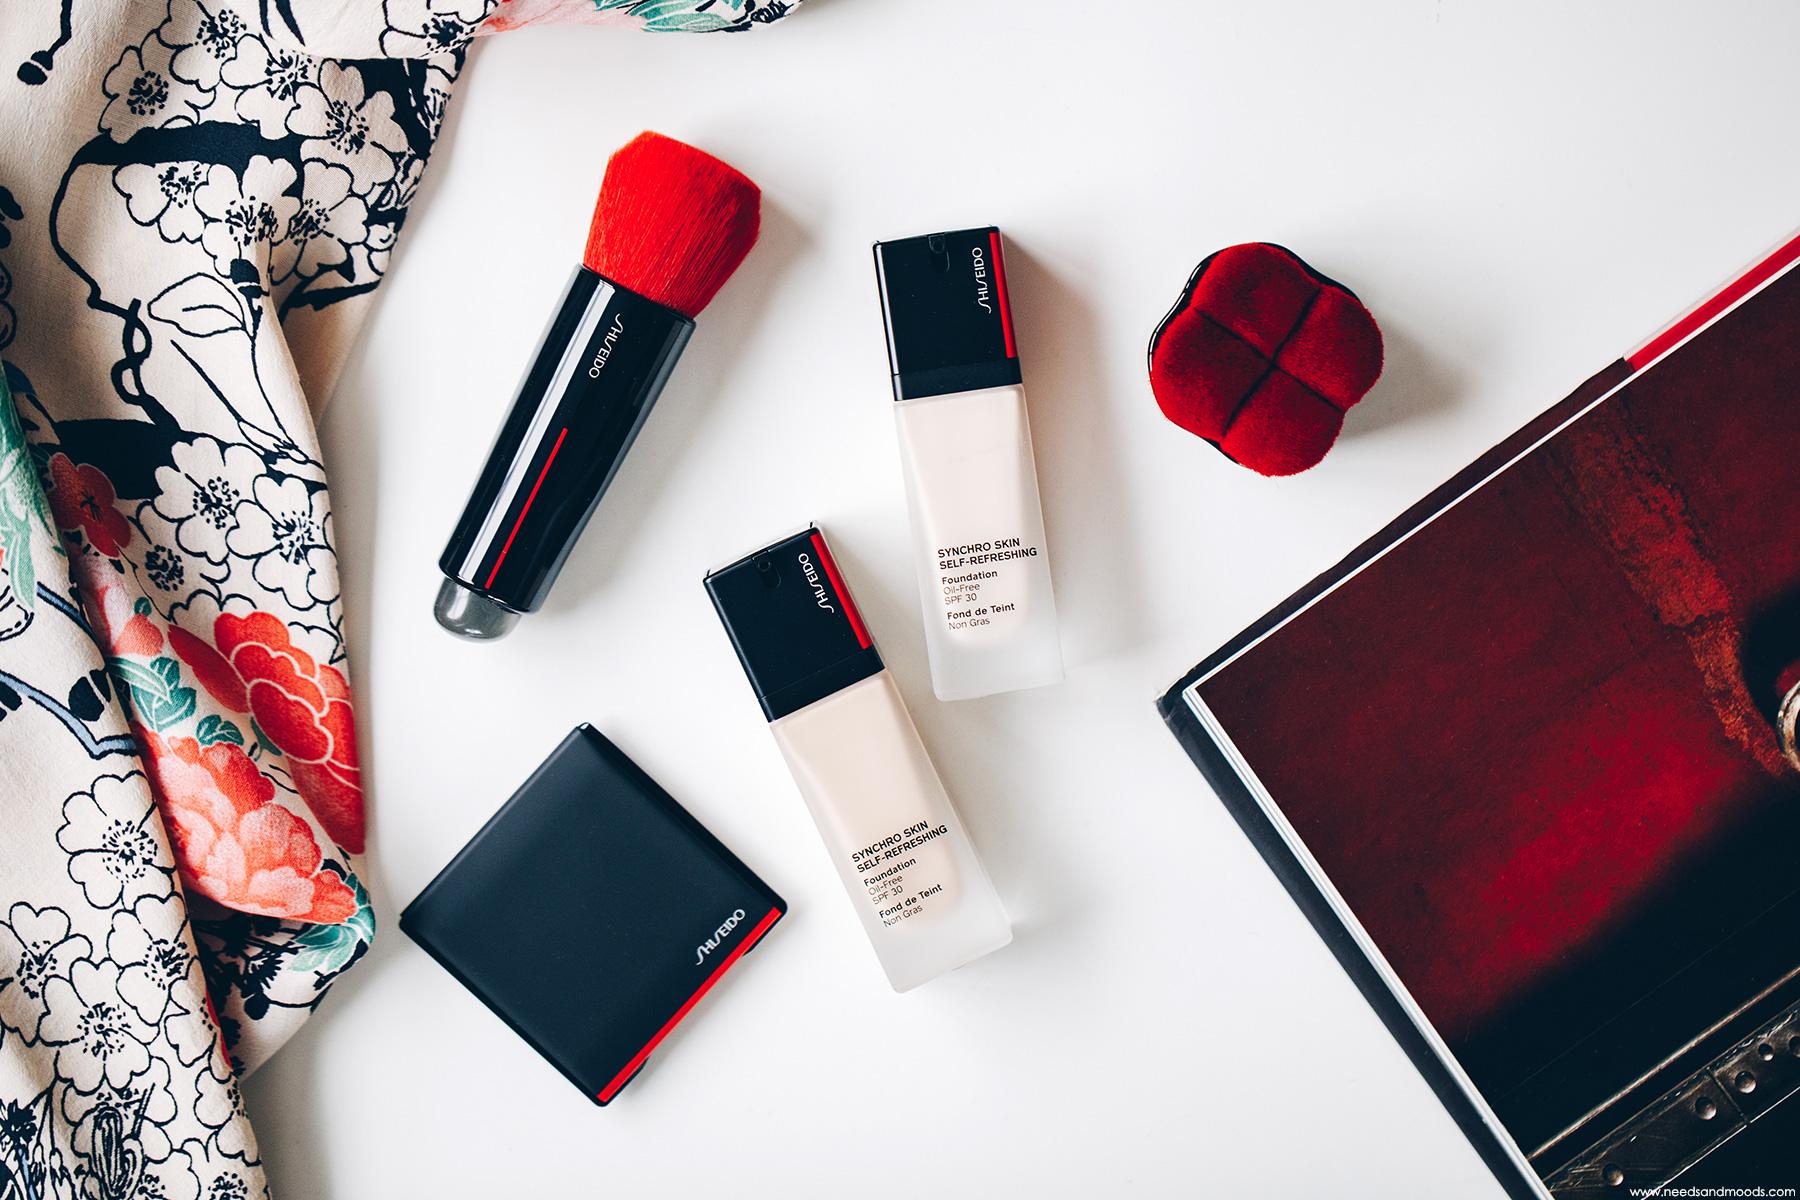 shiseido synchro skin self refreshing fond de teint